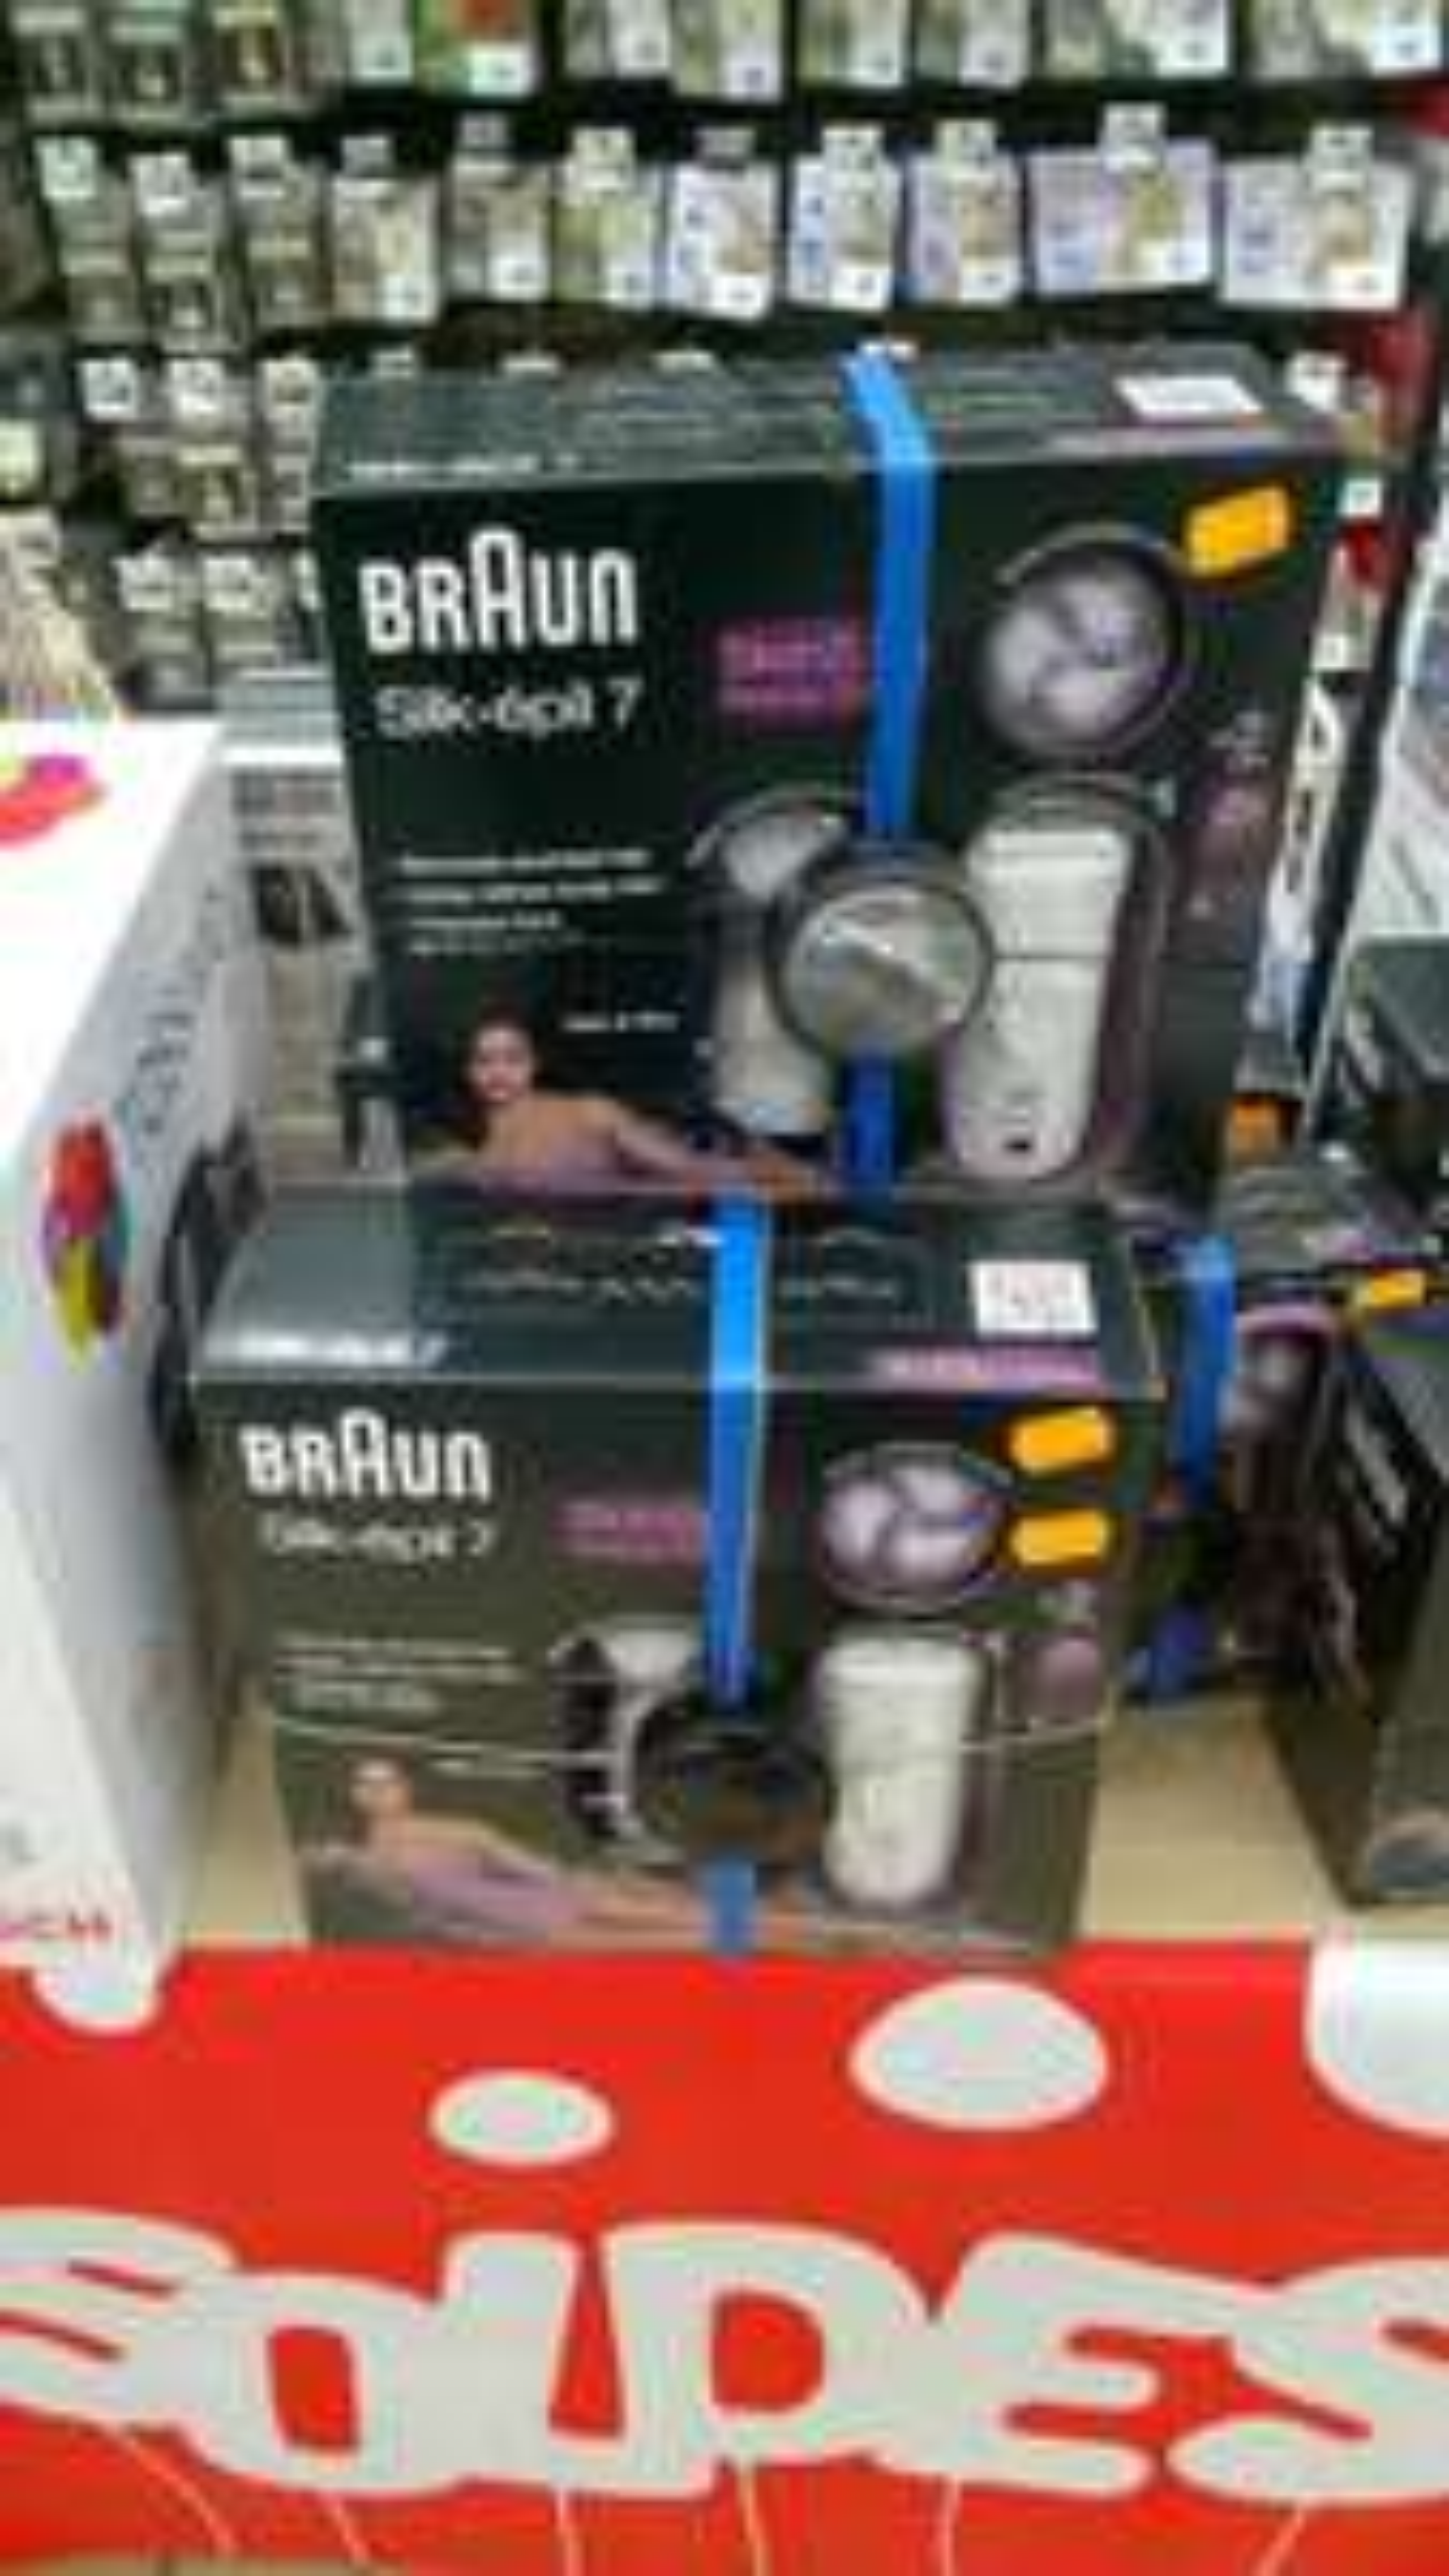 Epilateur Braun Silk Epil 7 SkinSpa Beauty Edition